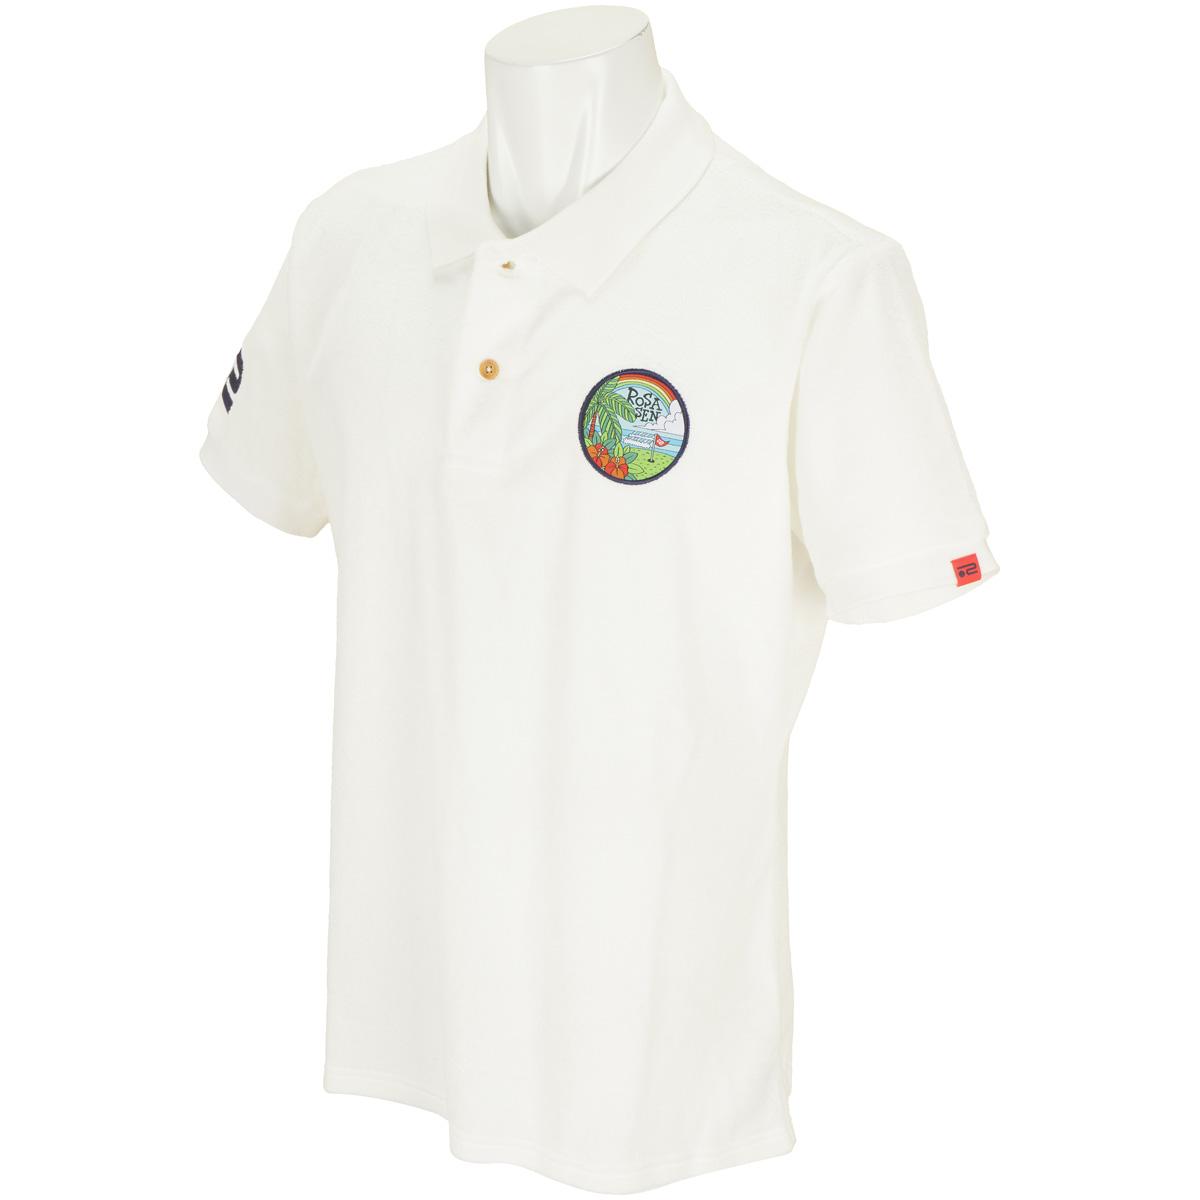 GDO限定 ルーズマンコラボ半袖ポロシャツ